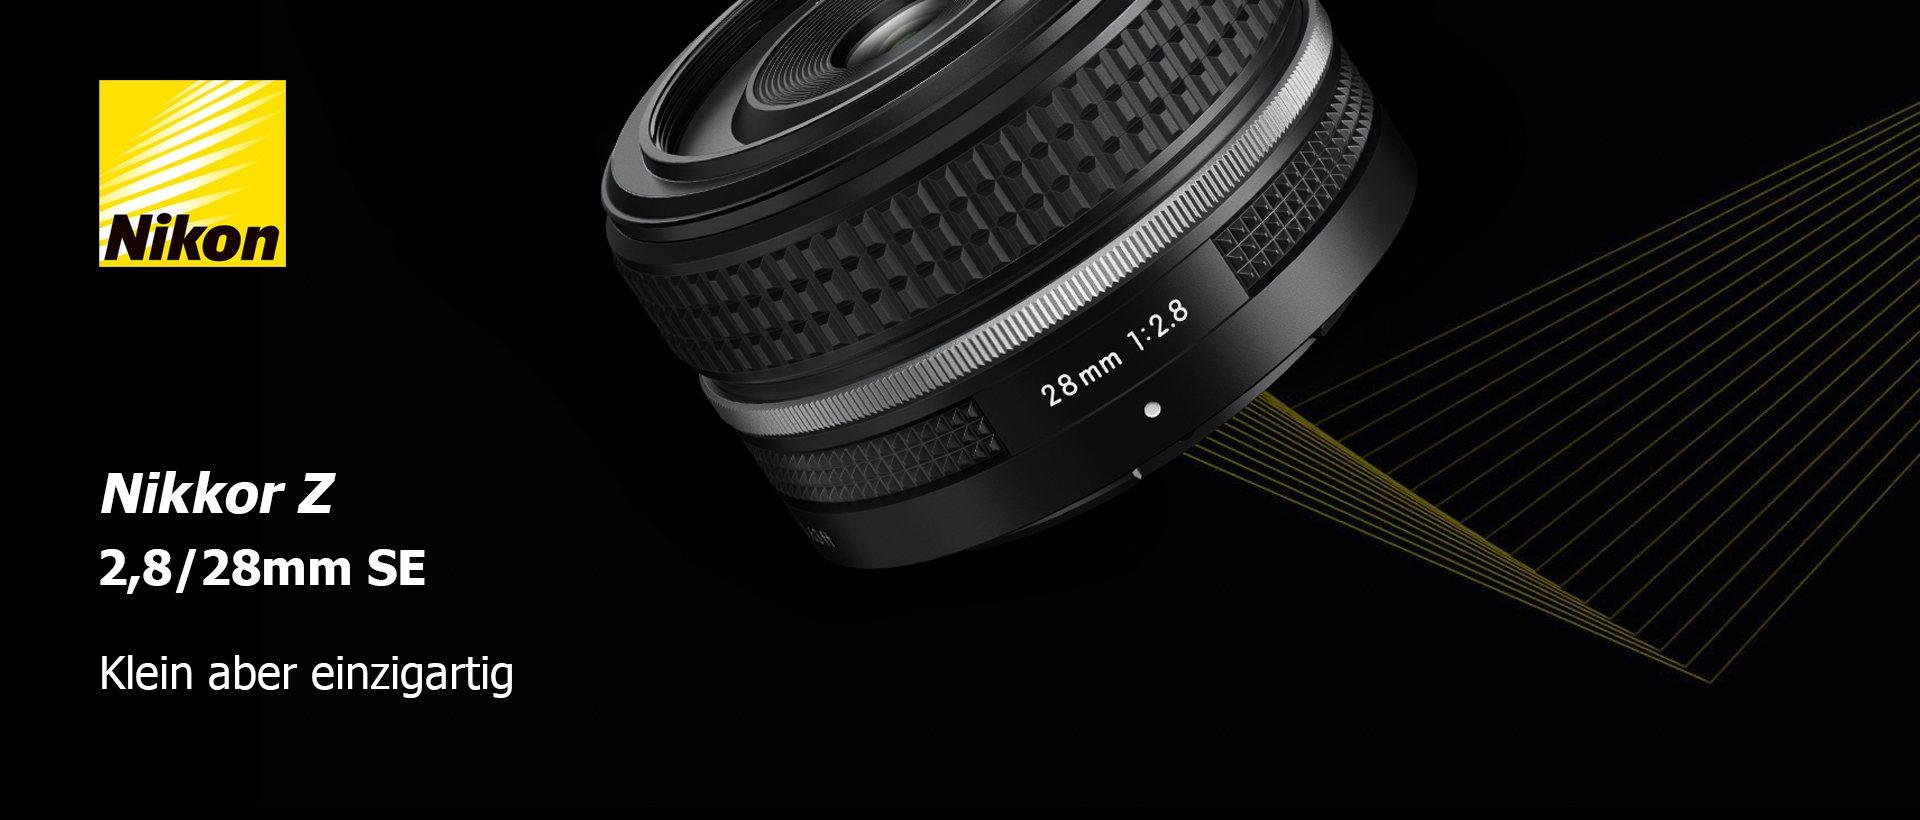 Nikon Z 2,8/28mm SE